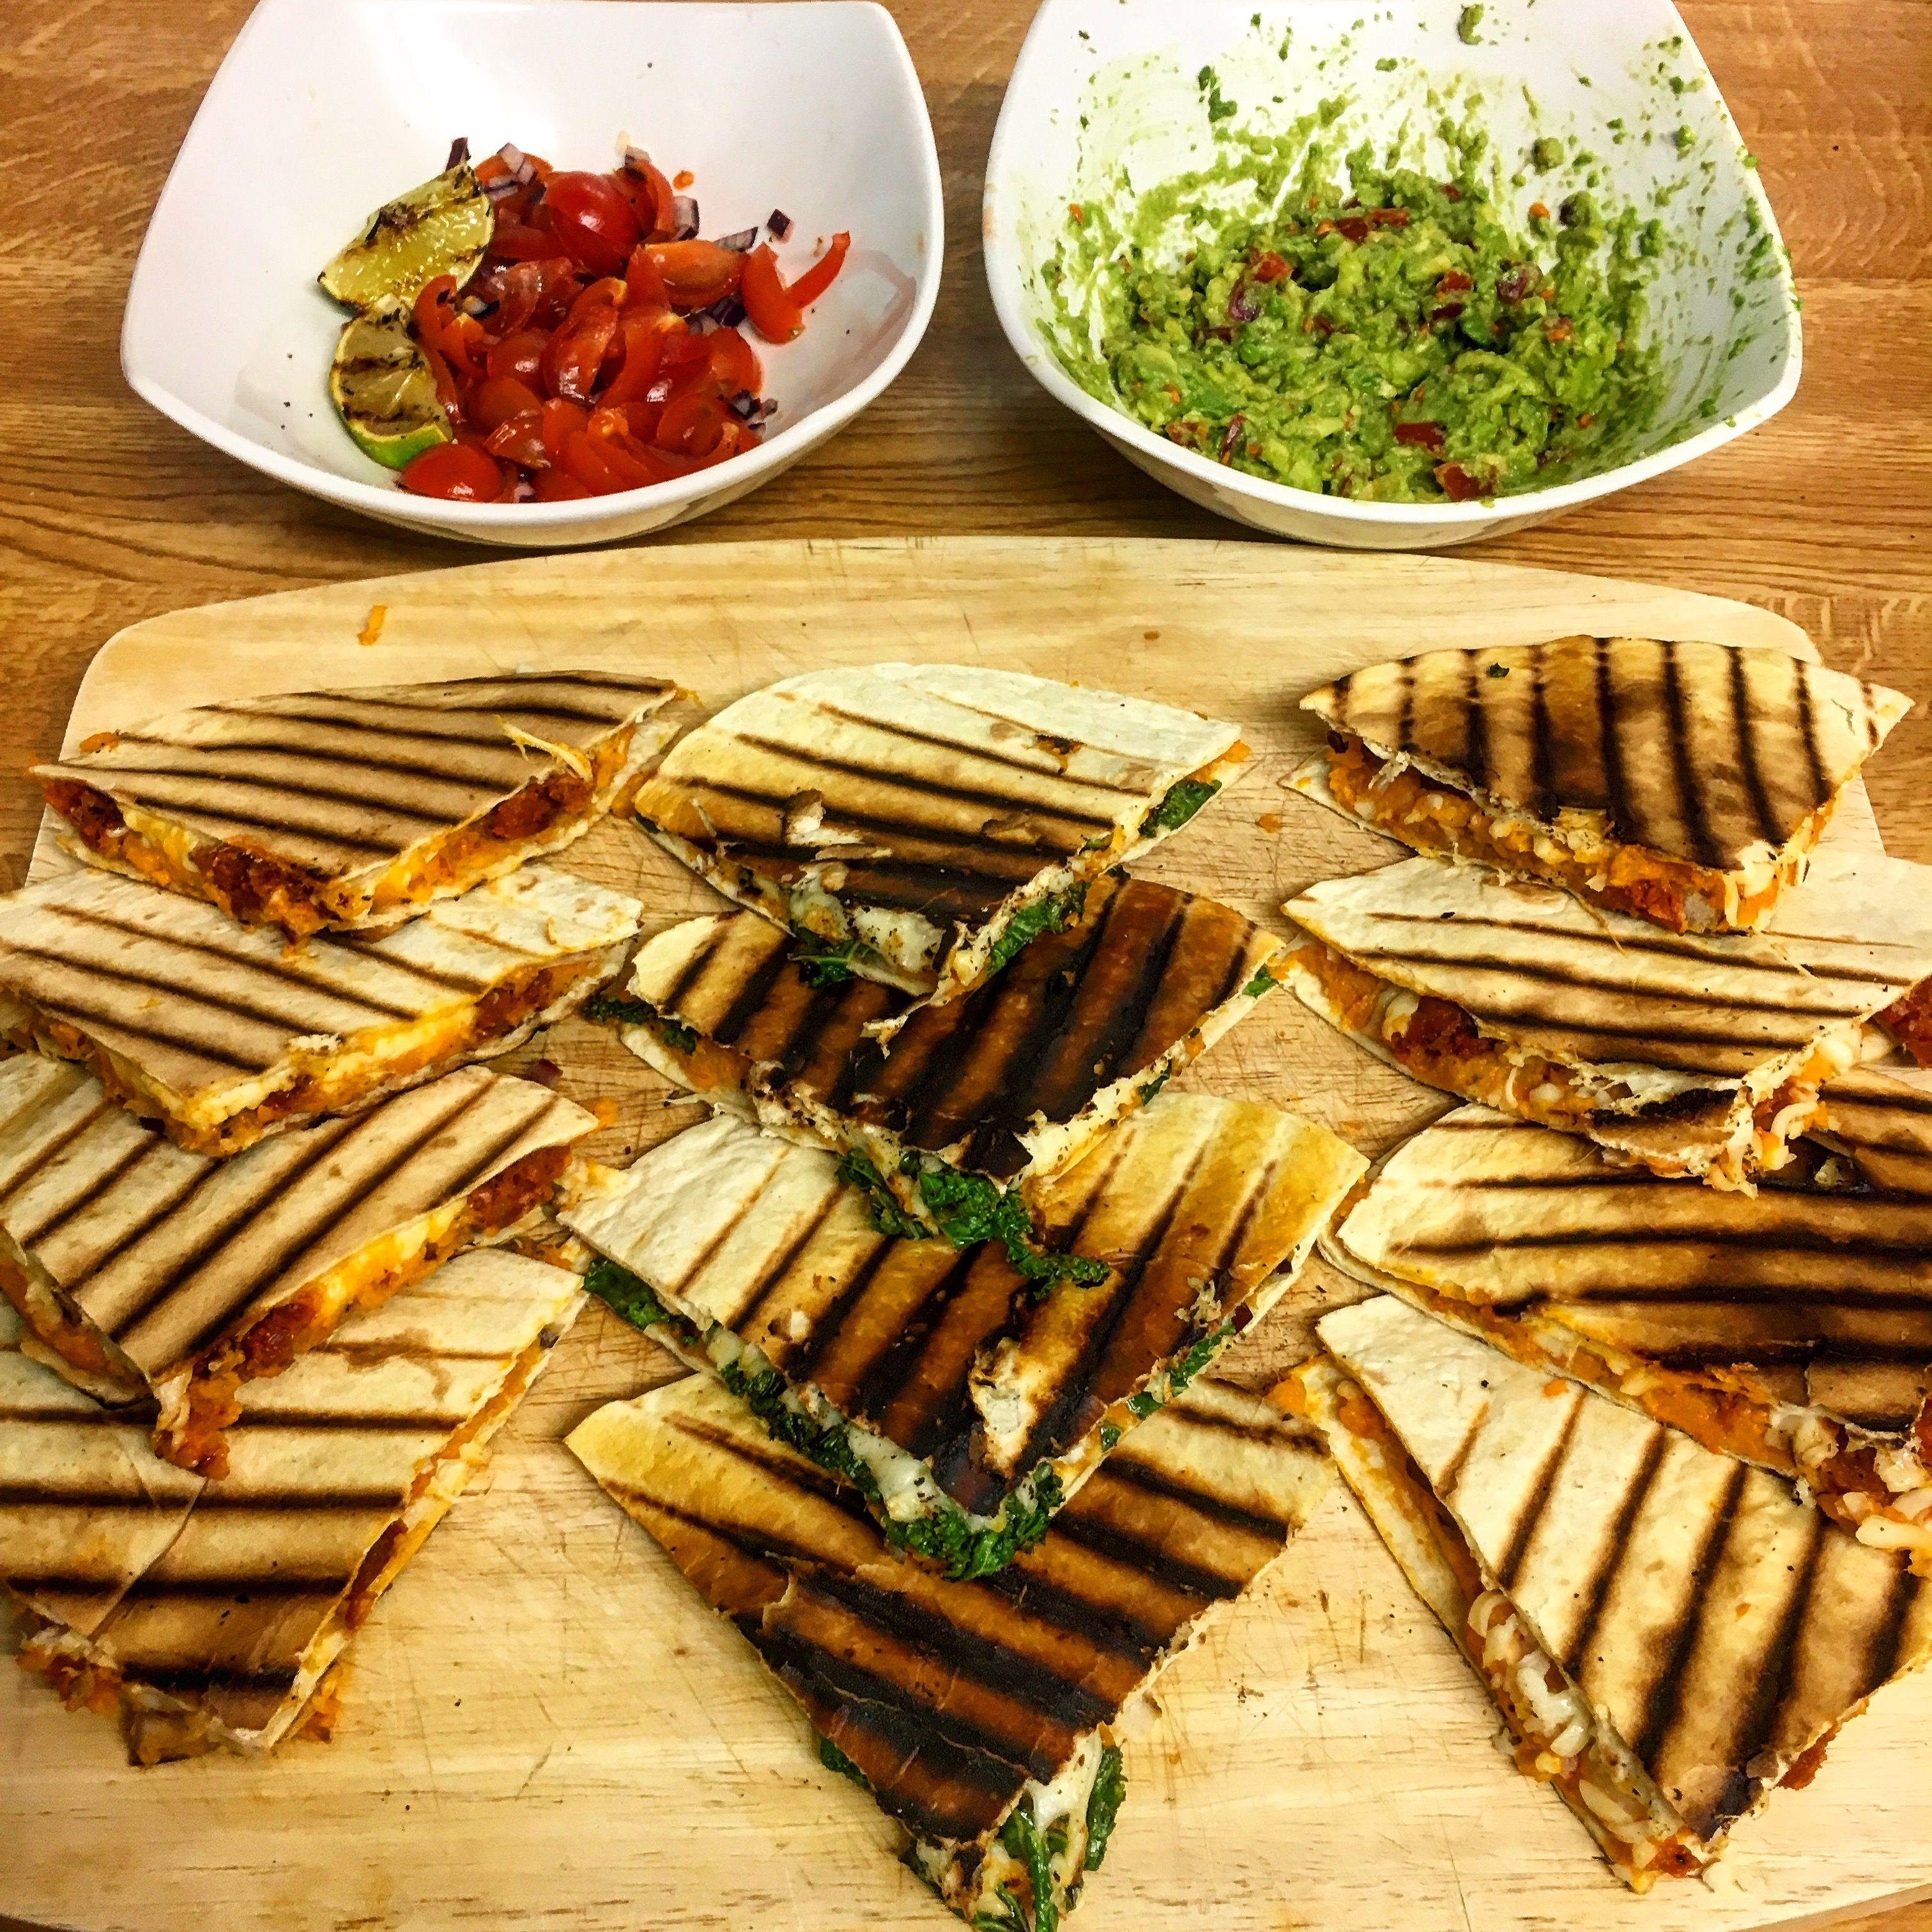 Sweet potato and chorizo and sweet potato, chilli and kale quesadillas with tomato salsa and guacamole